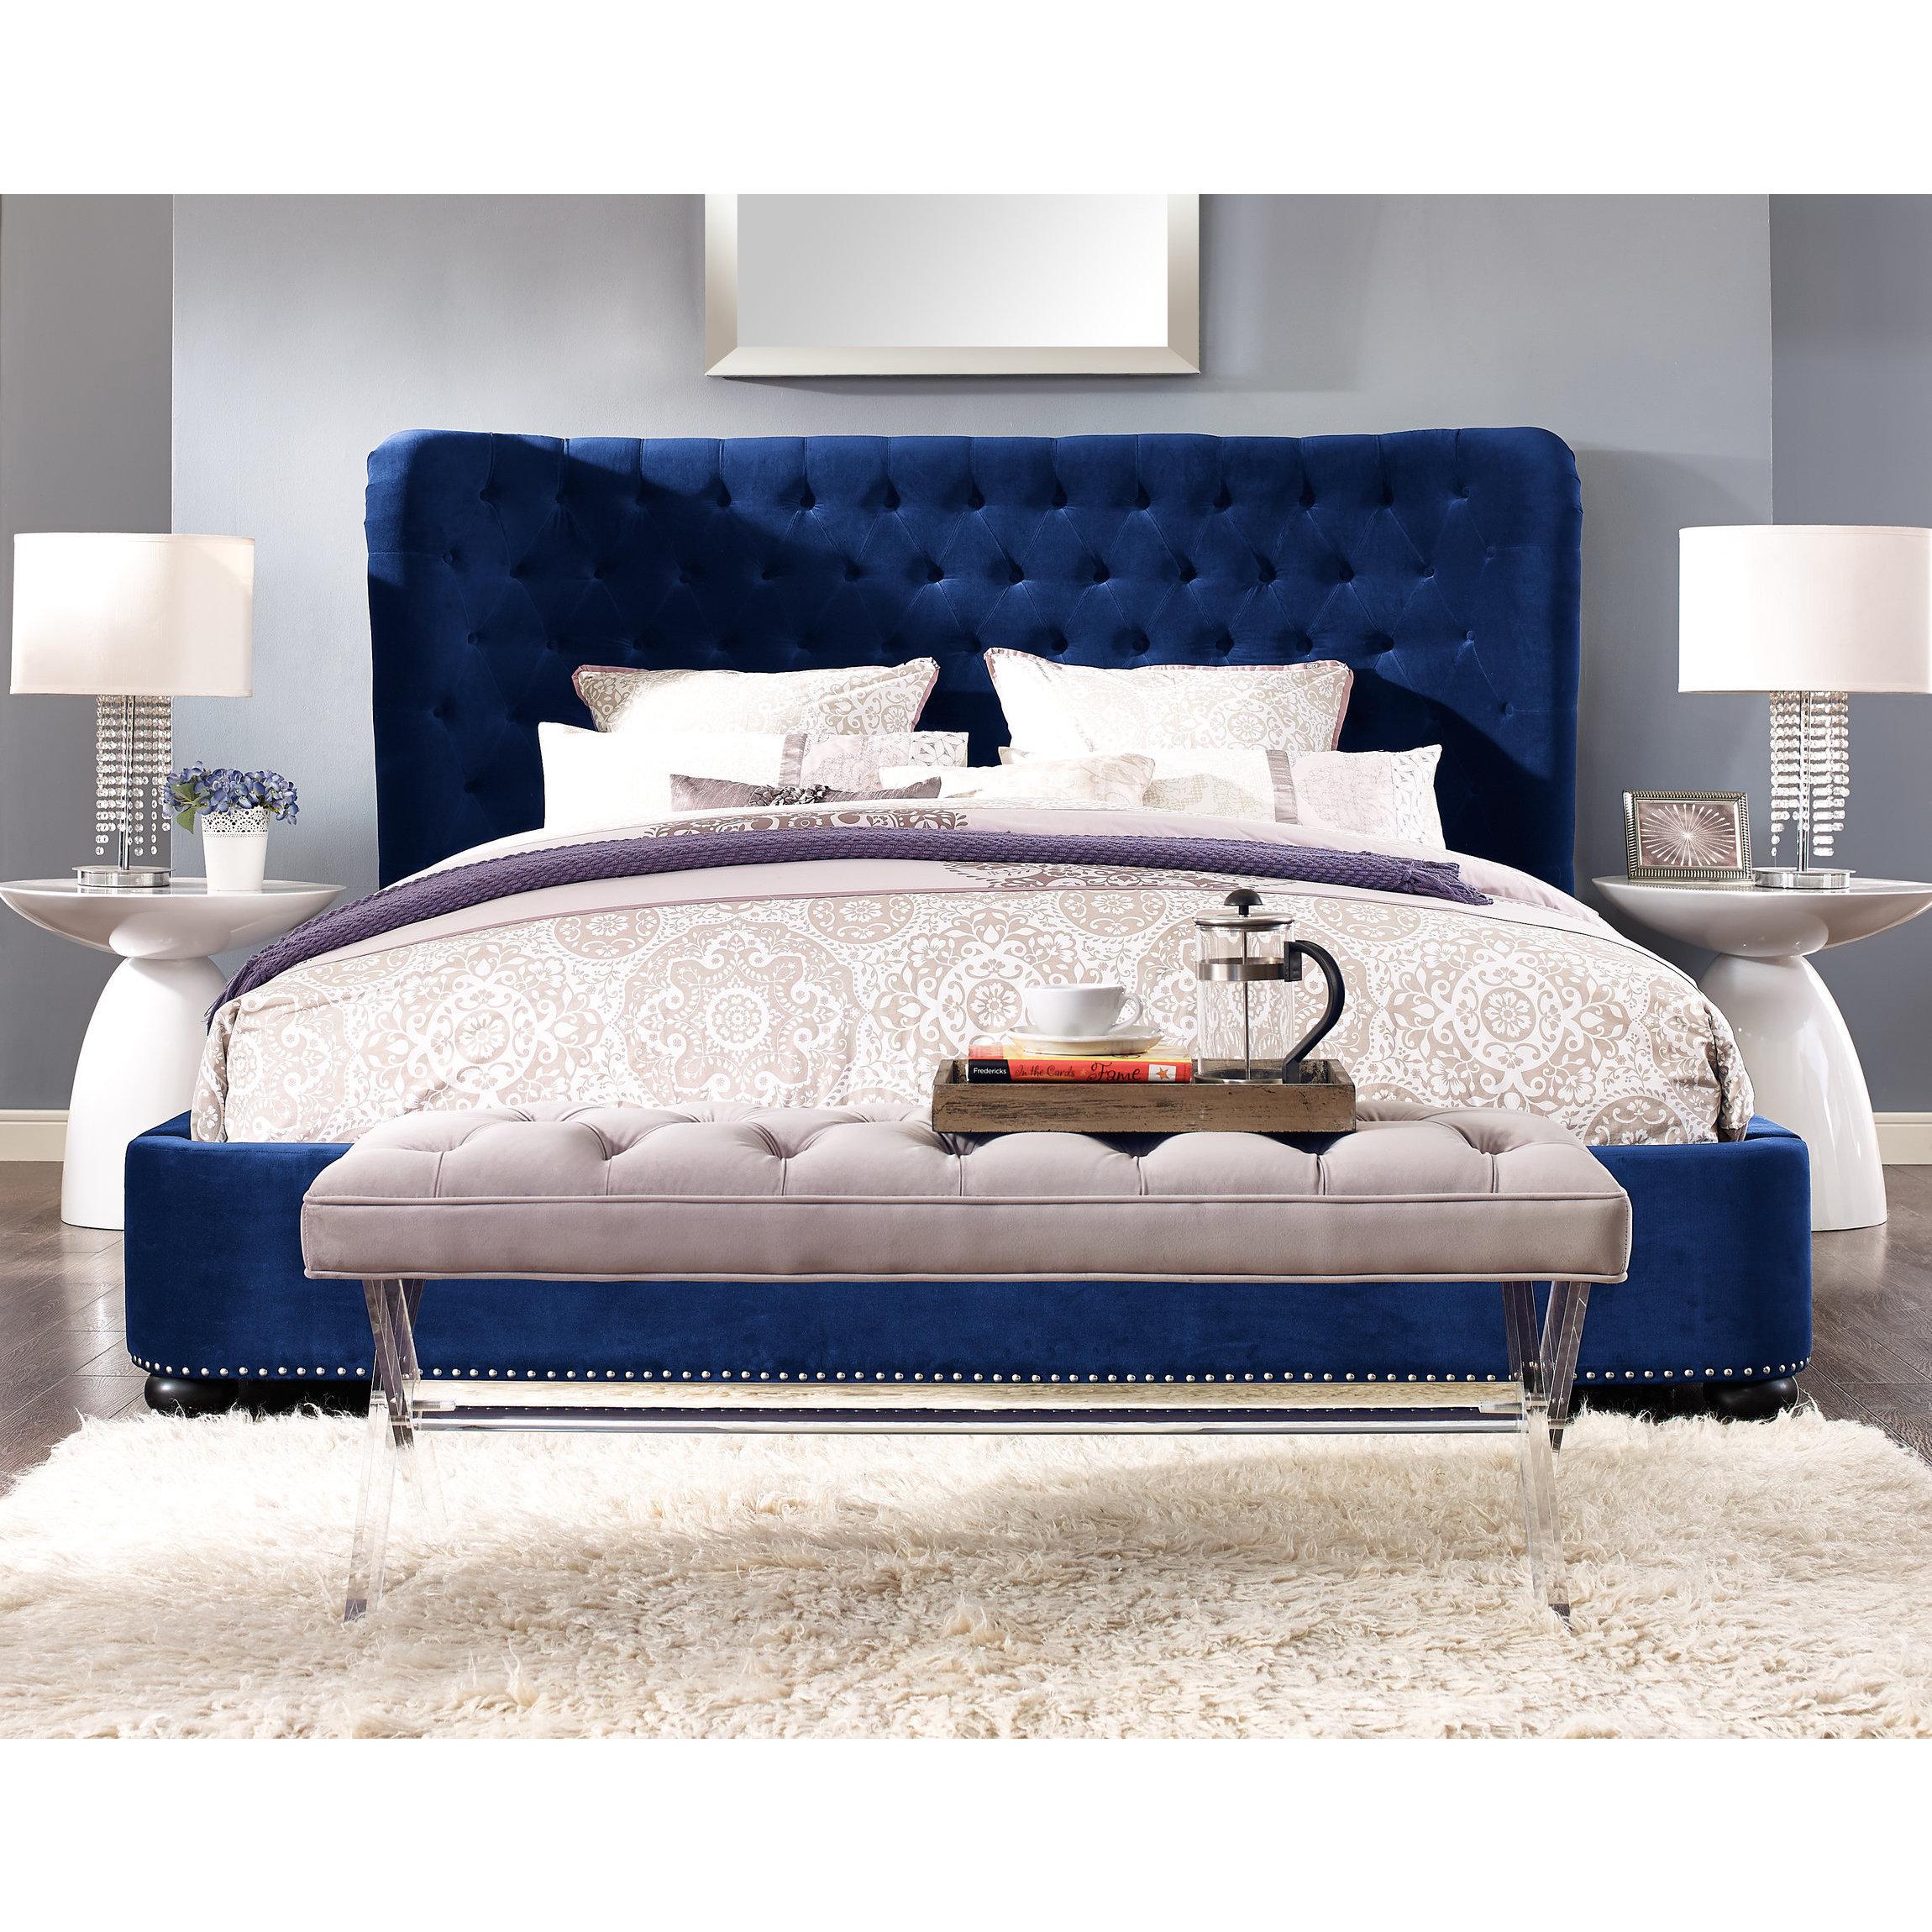 Furniture Bedroom Headboards Blue